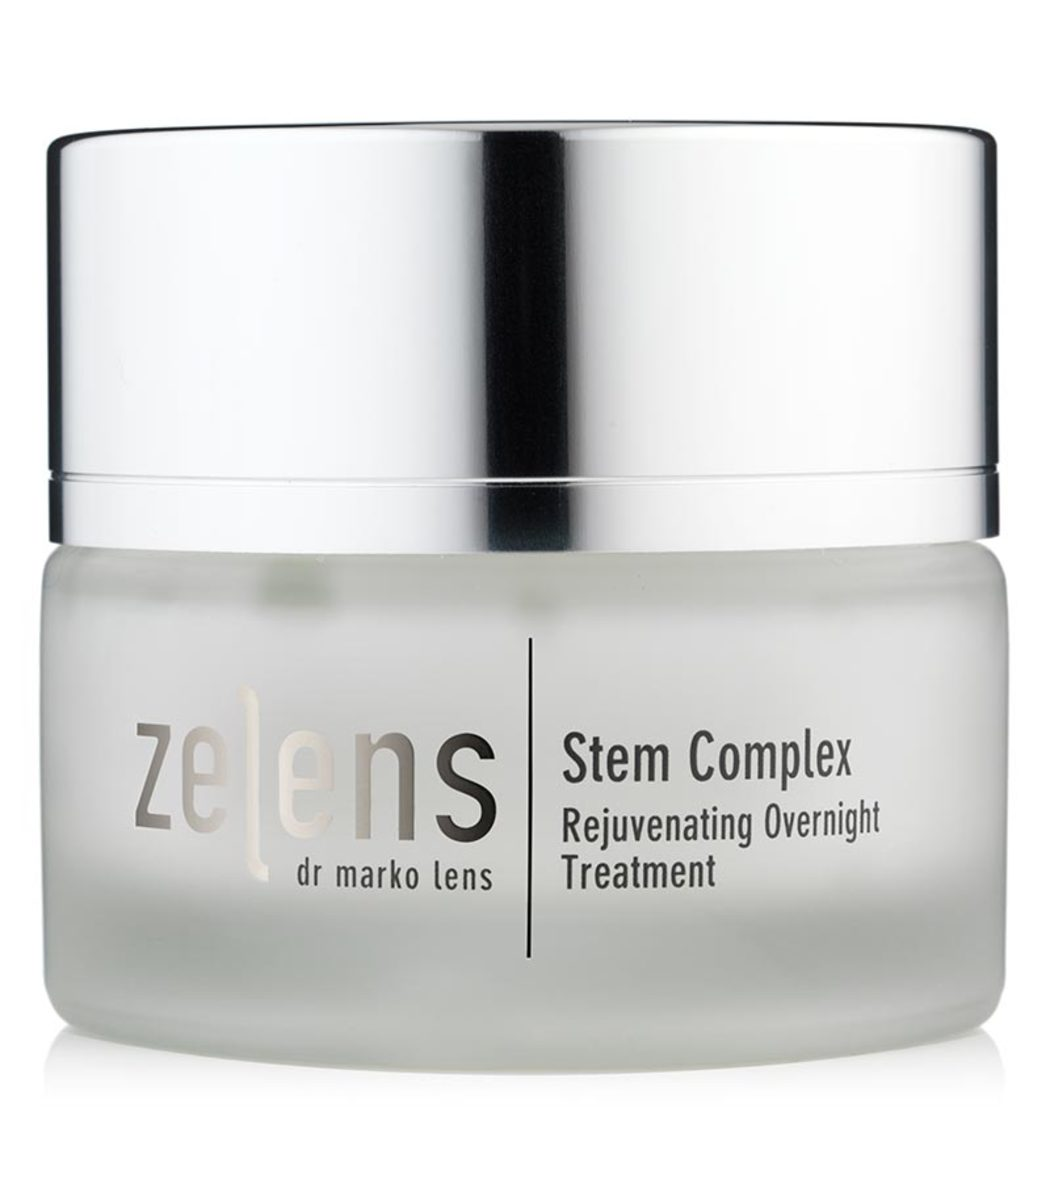 ZELENS Stem Complex Rejuvenating Overnight Treatment